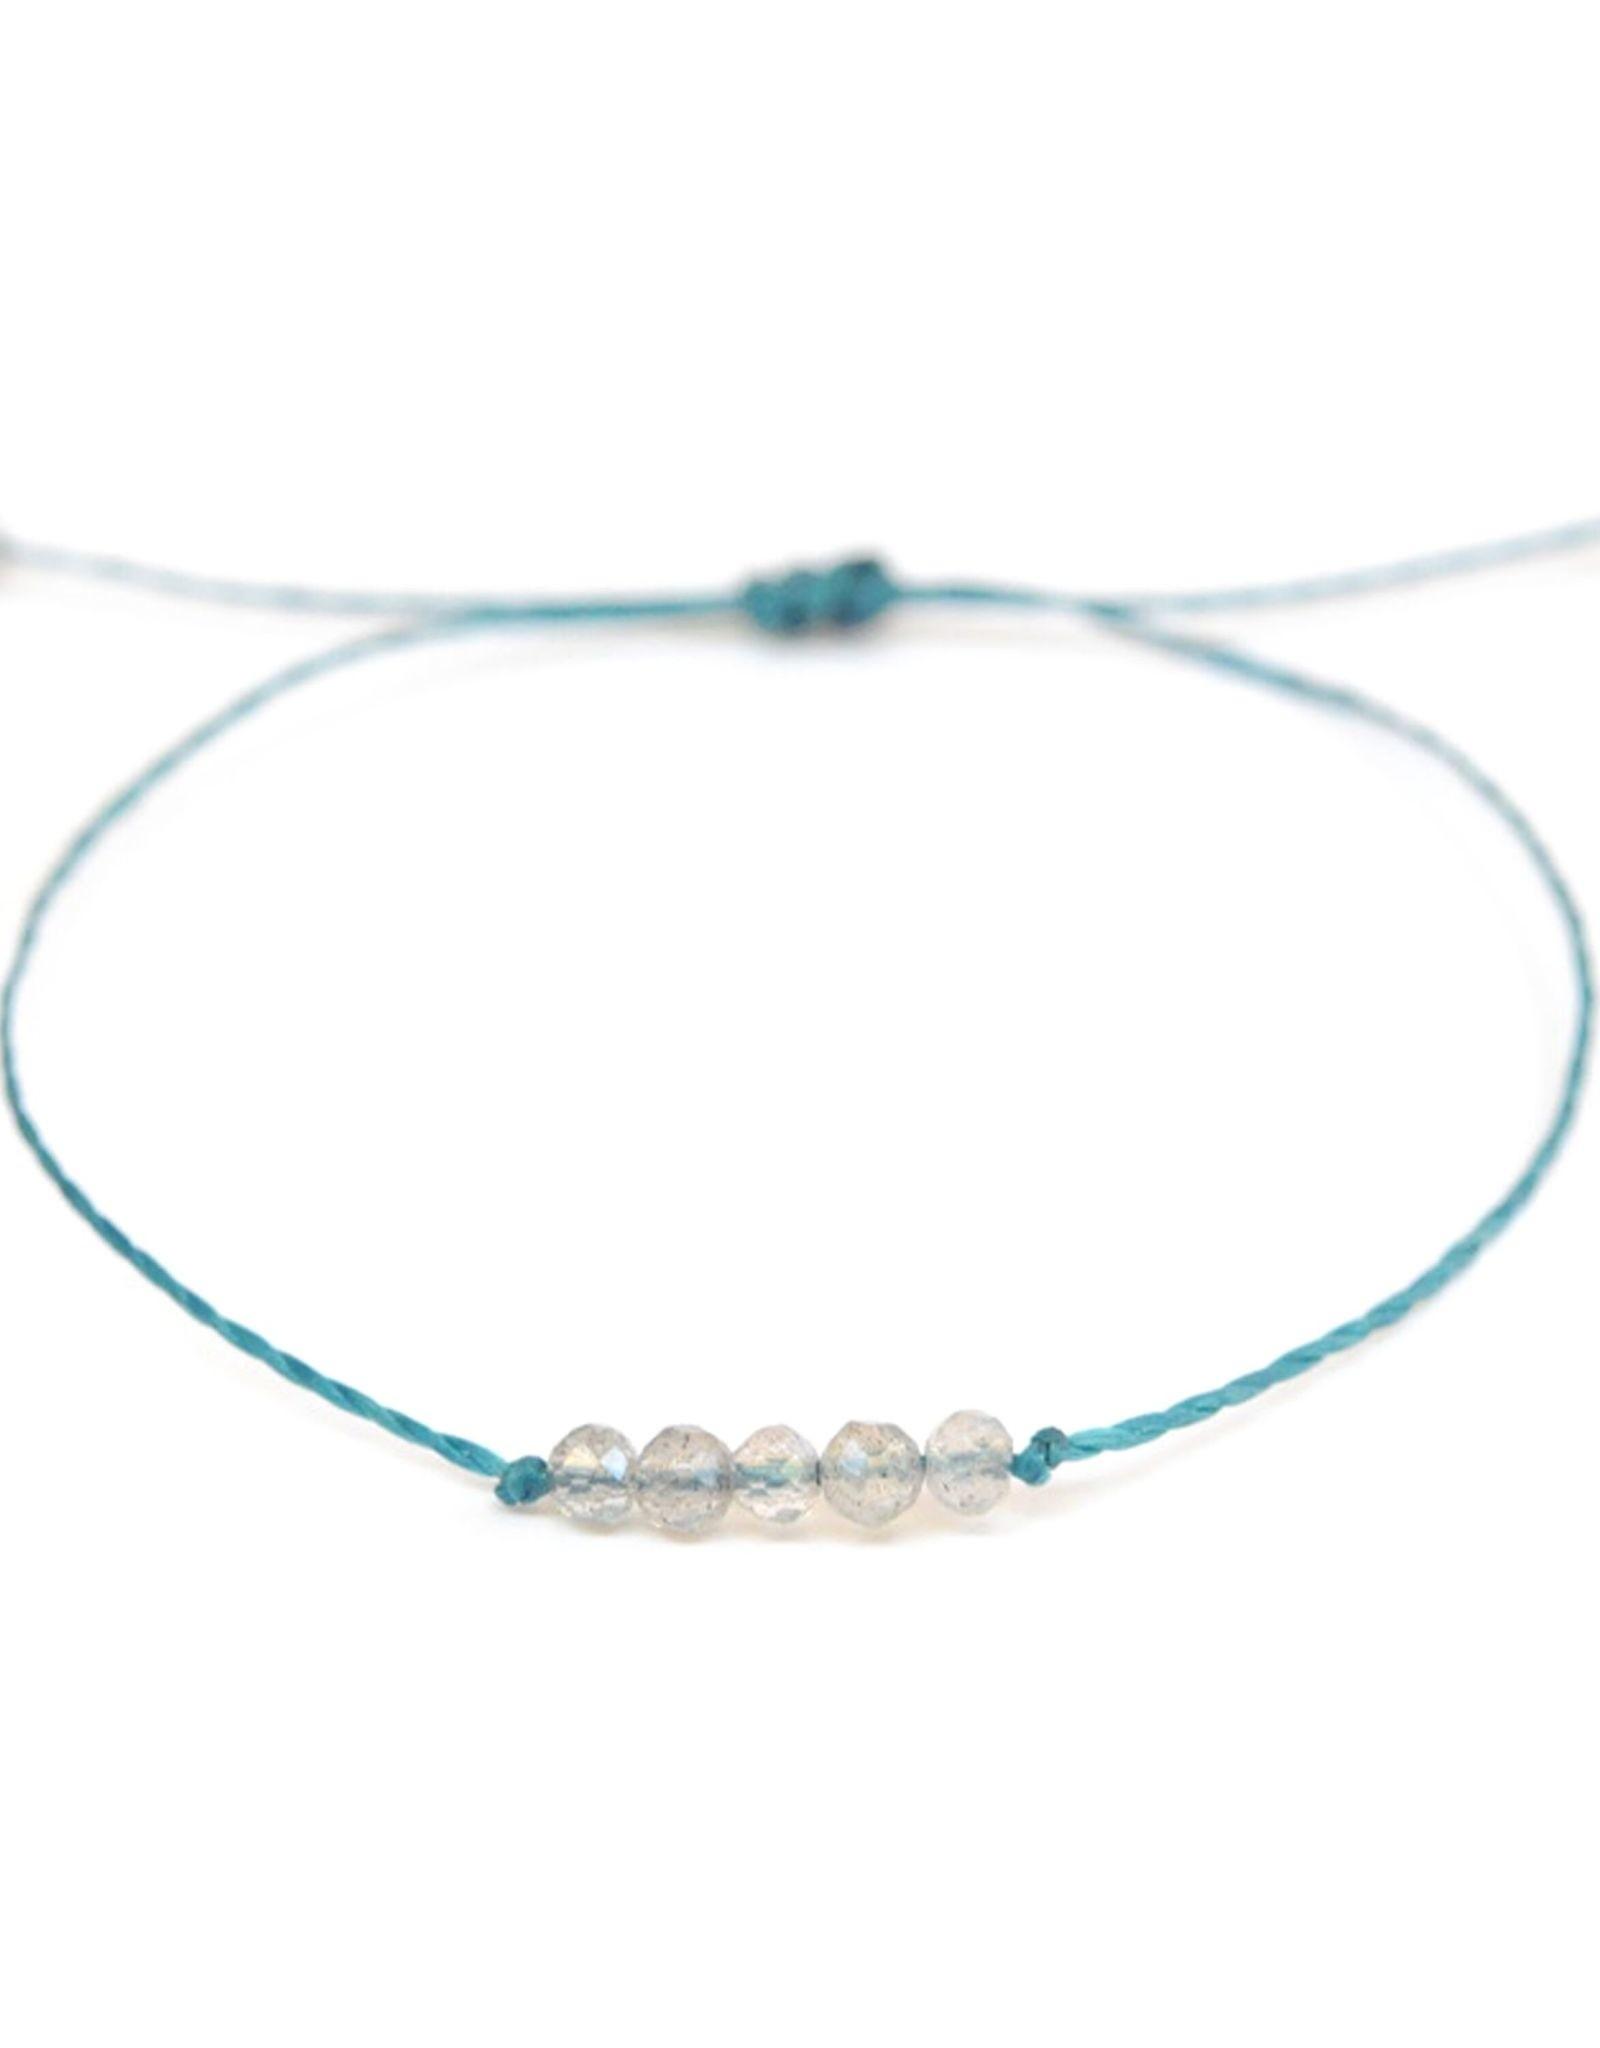 Waxed Thread Bracelet With Labradorite Beads